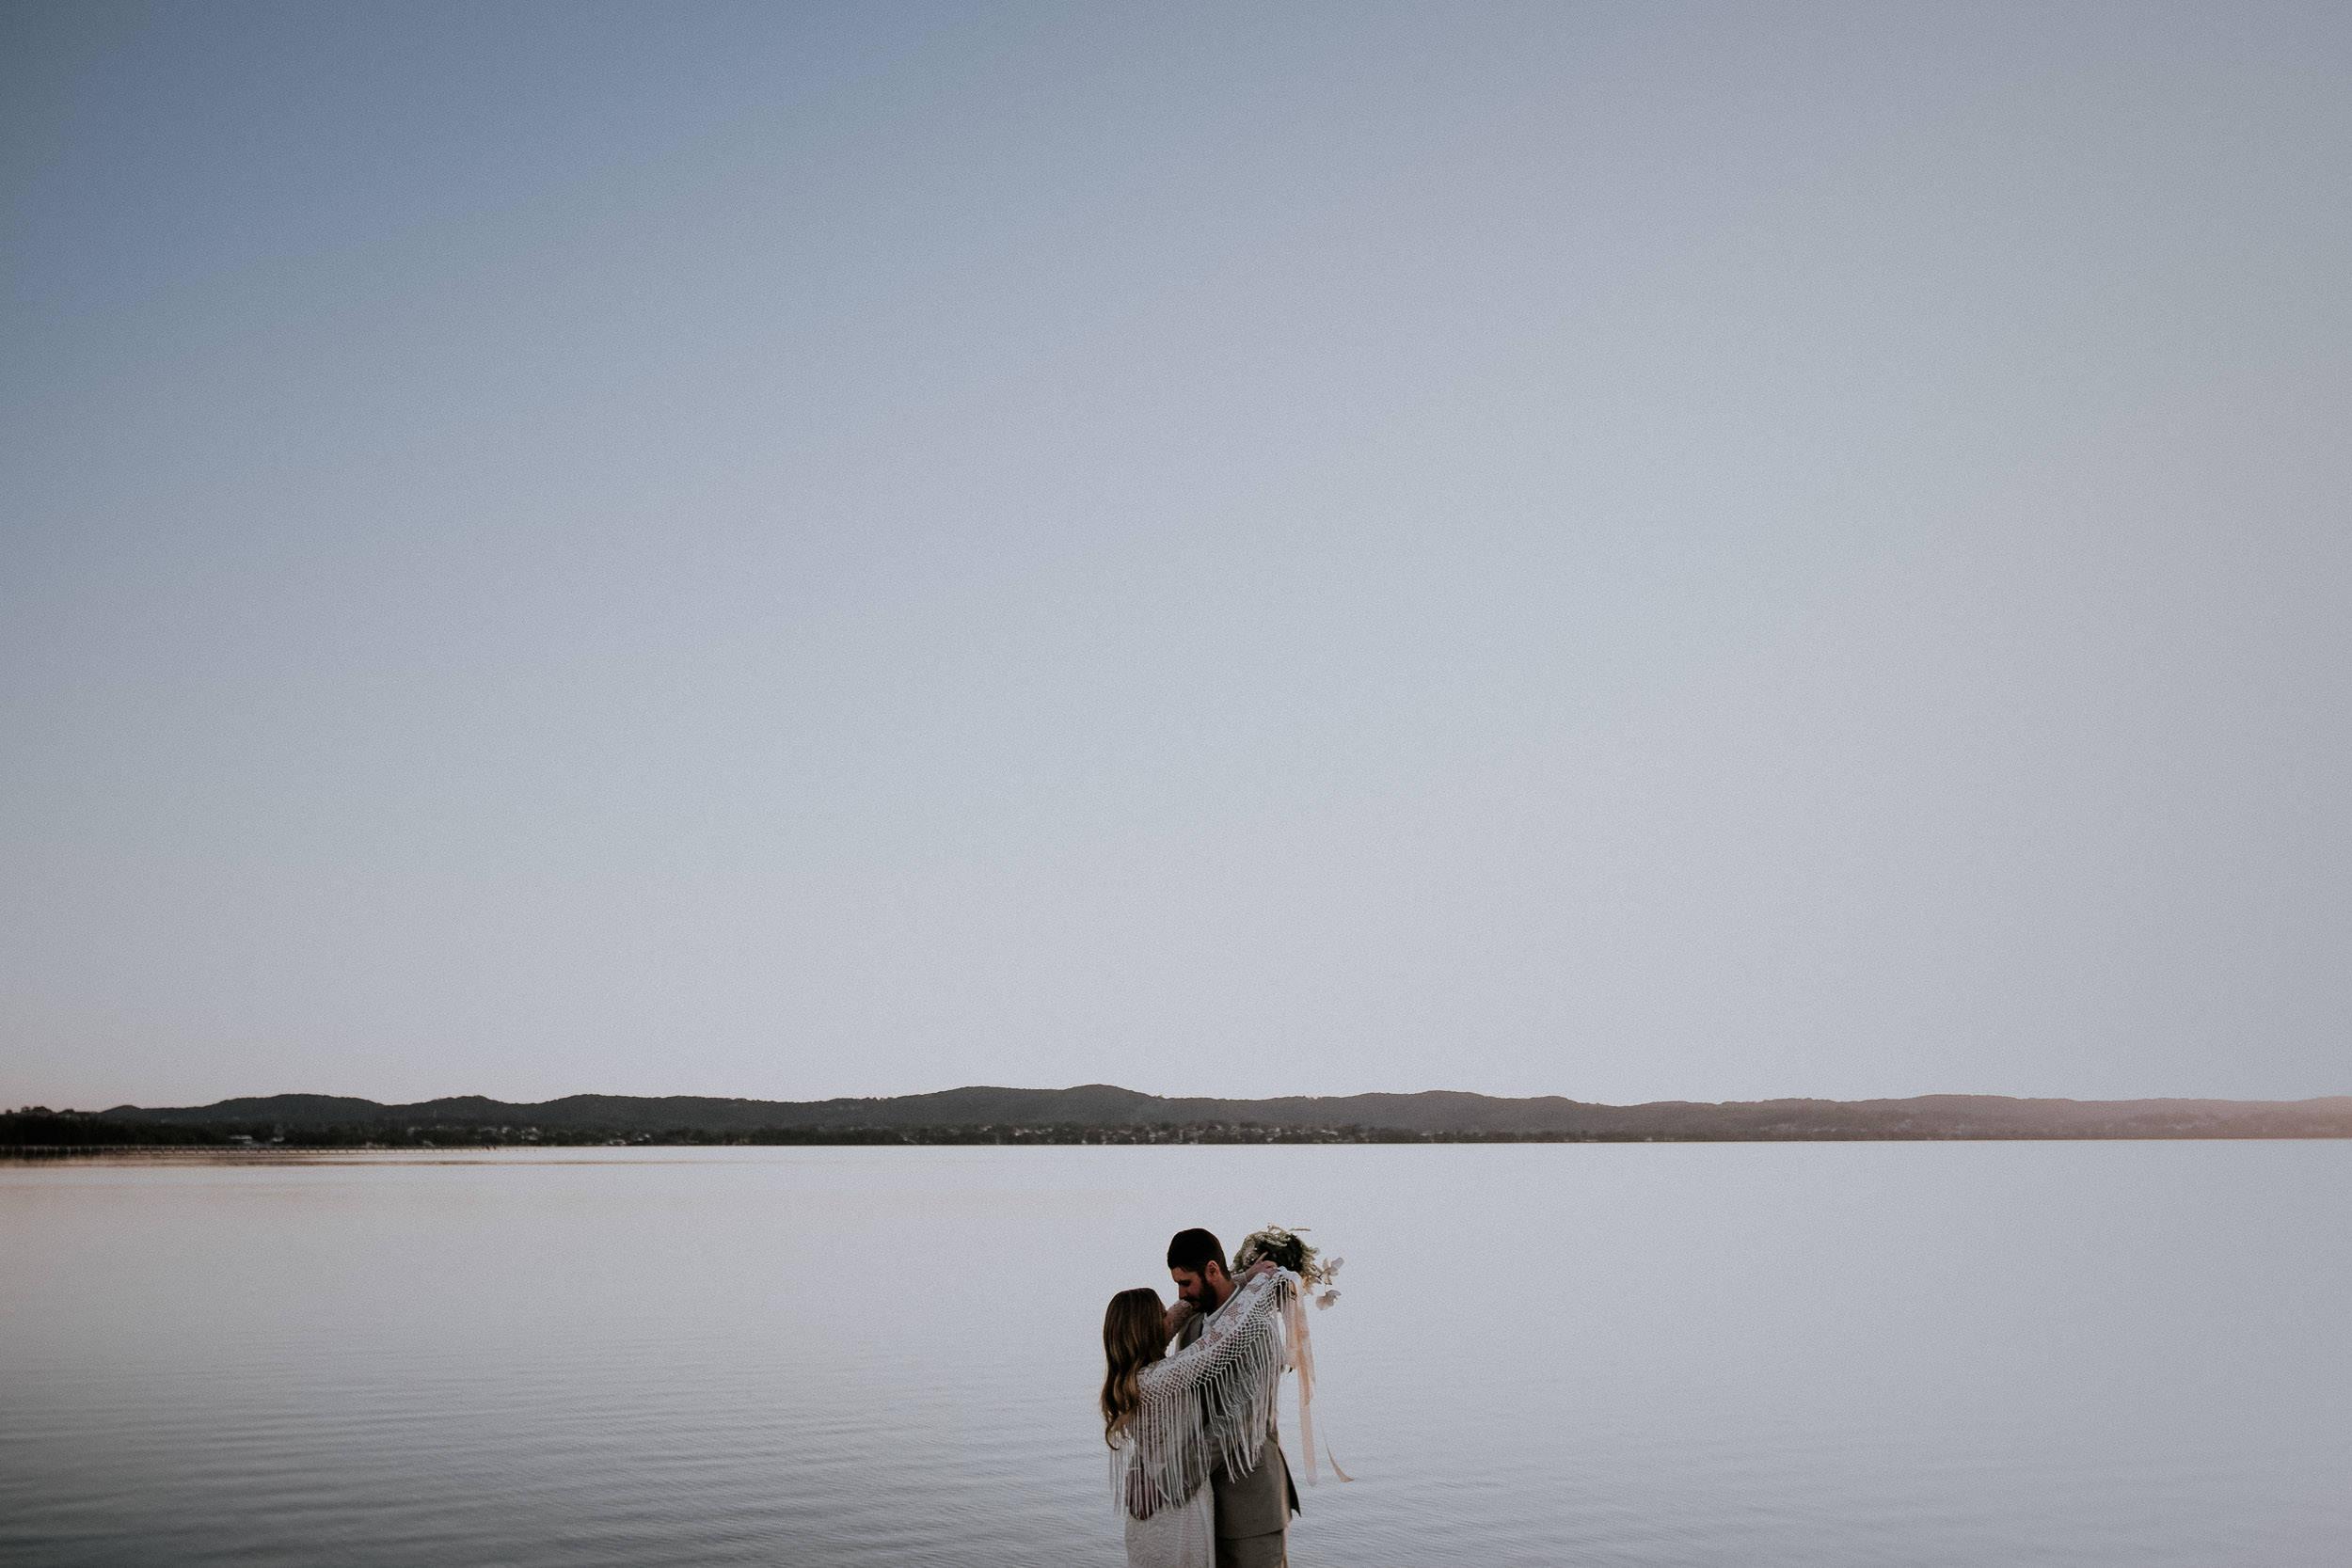 S&A Elopement - Kings & Thieves - Shred 'Til Dead - Central Coast Beach Forest Wedding - 391.jpg